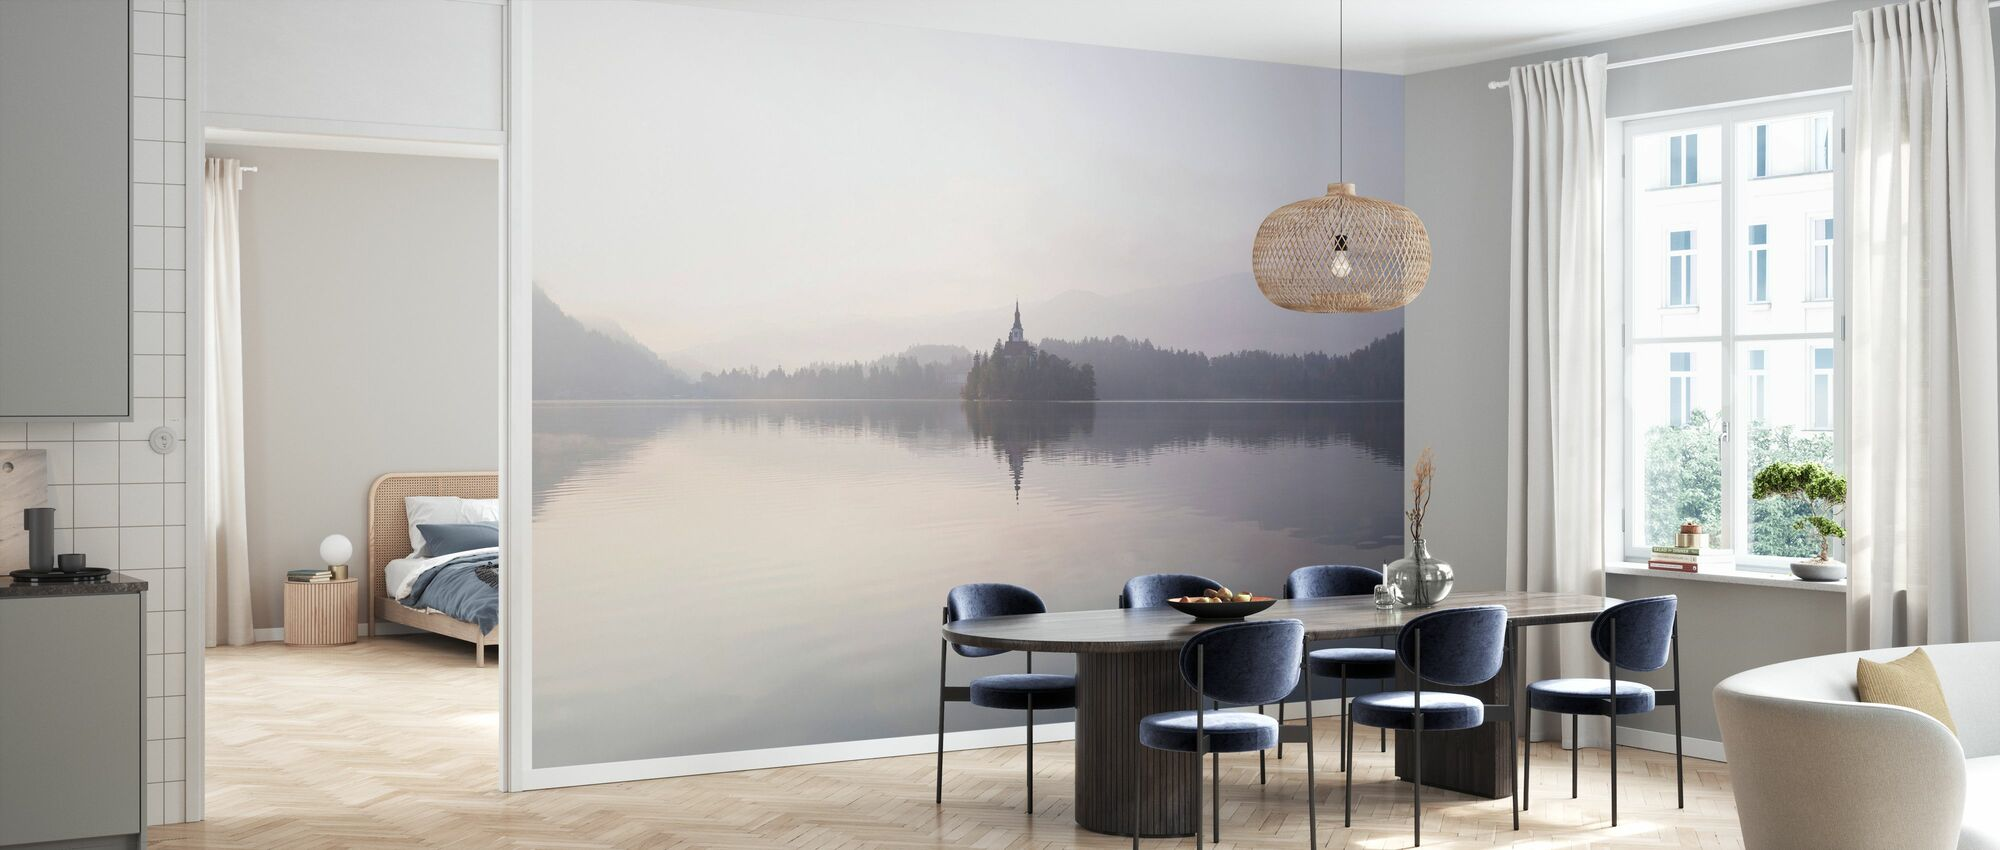 Lake Bled at Sunrise - Wallpaper - Kitchen